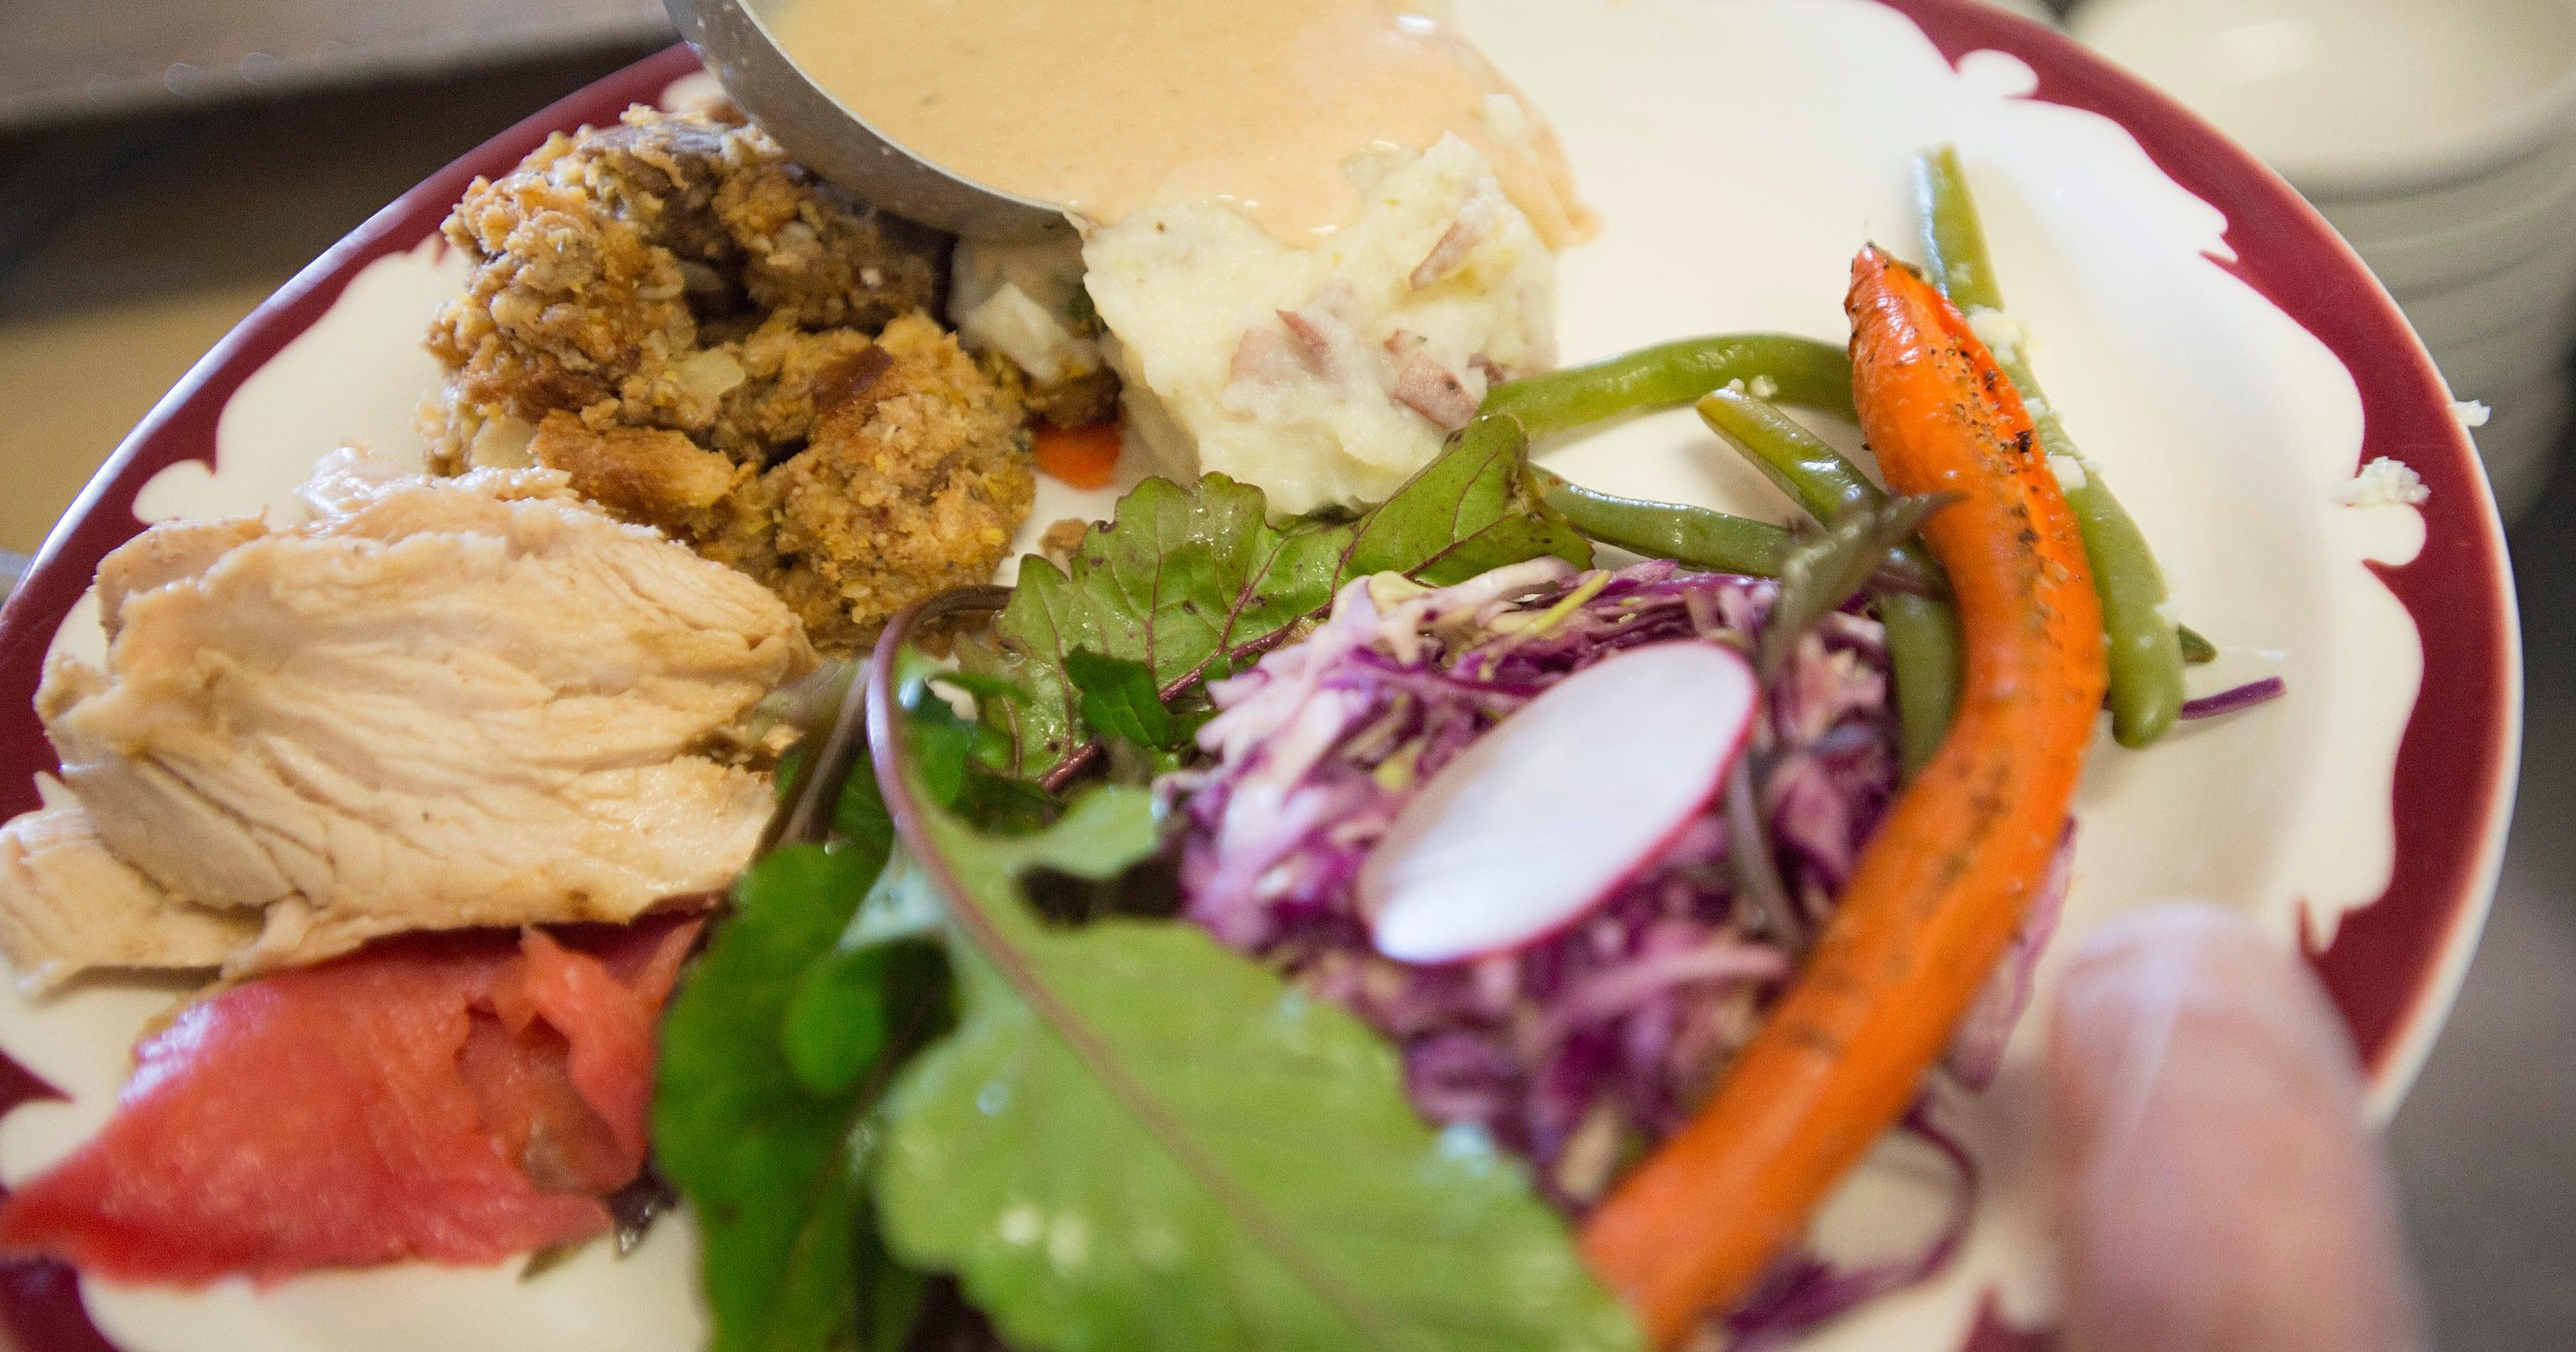 Fort Collins Northern Colorado Restaurants Open On